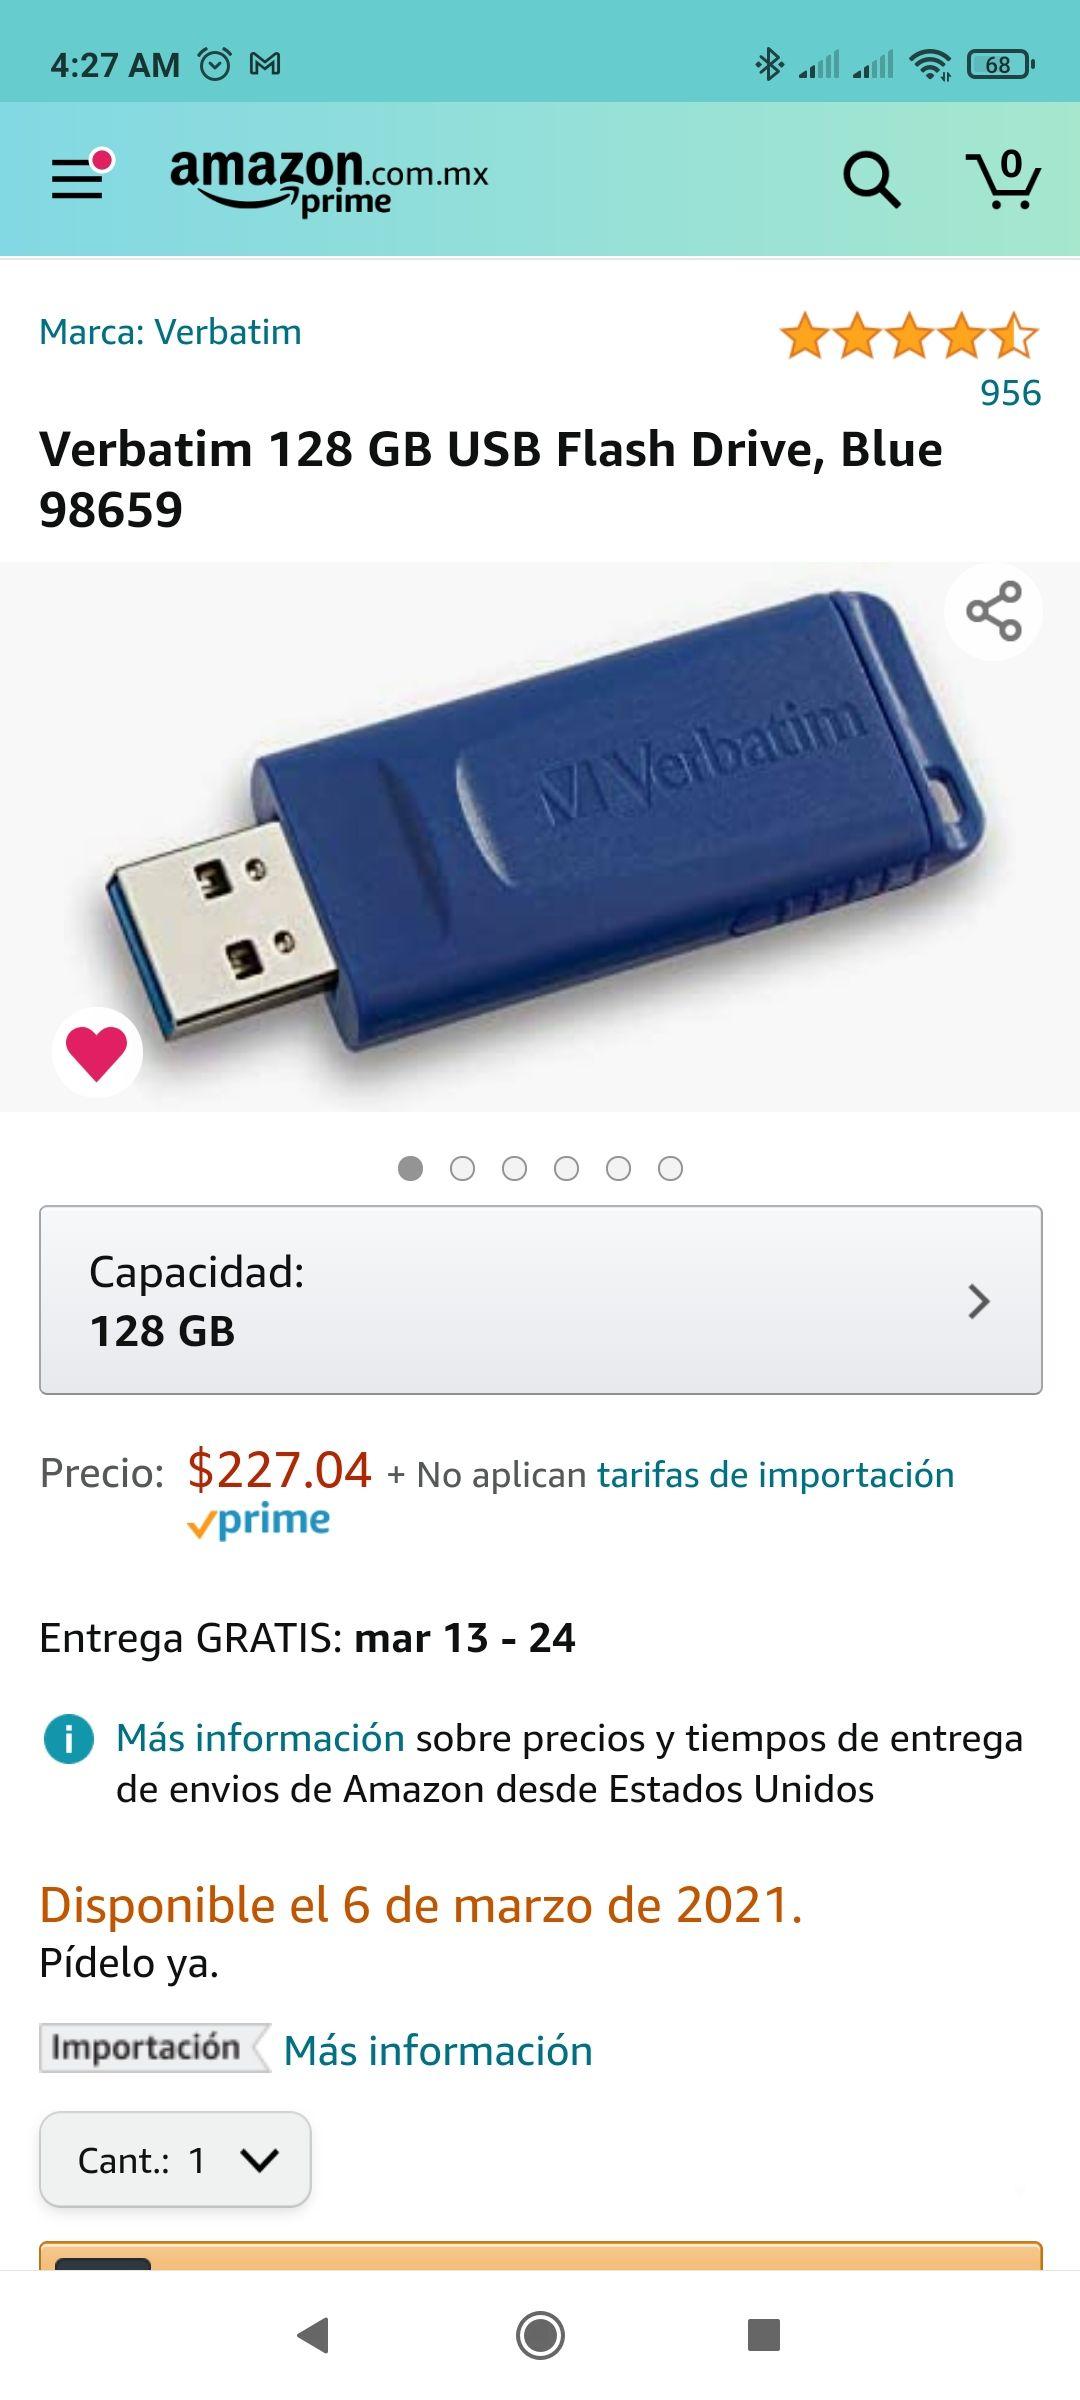 Amazon: Verbatim 128 GB USB Flash Drive, Blue 98659